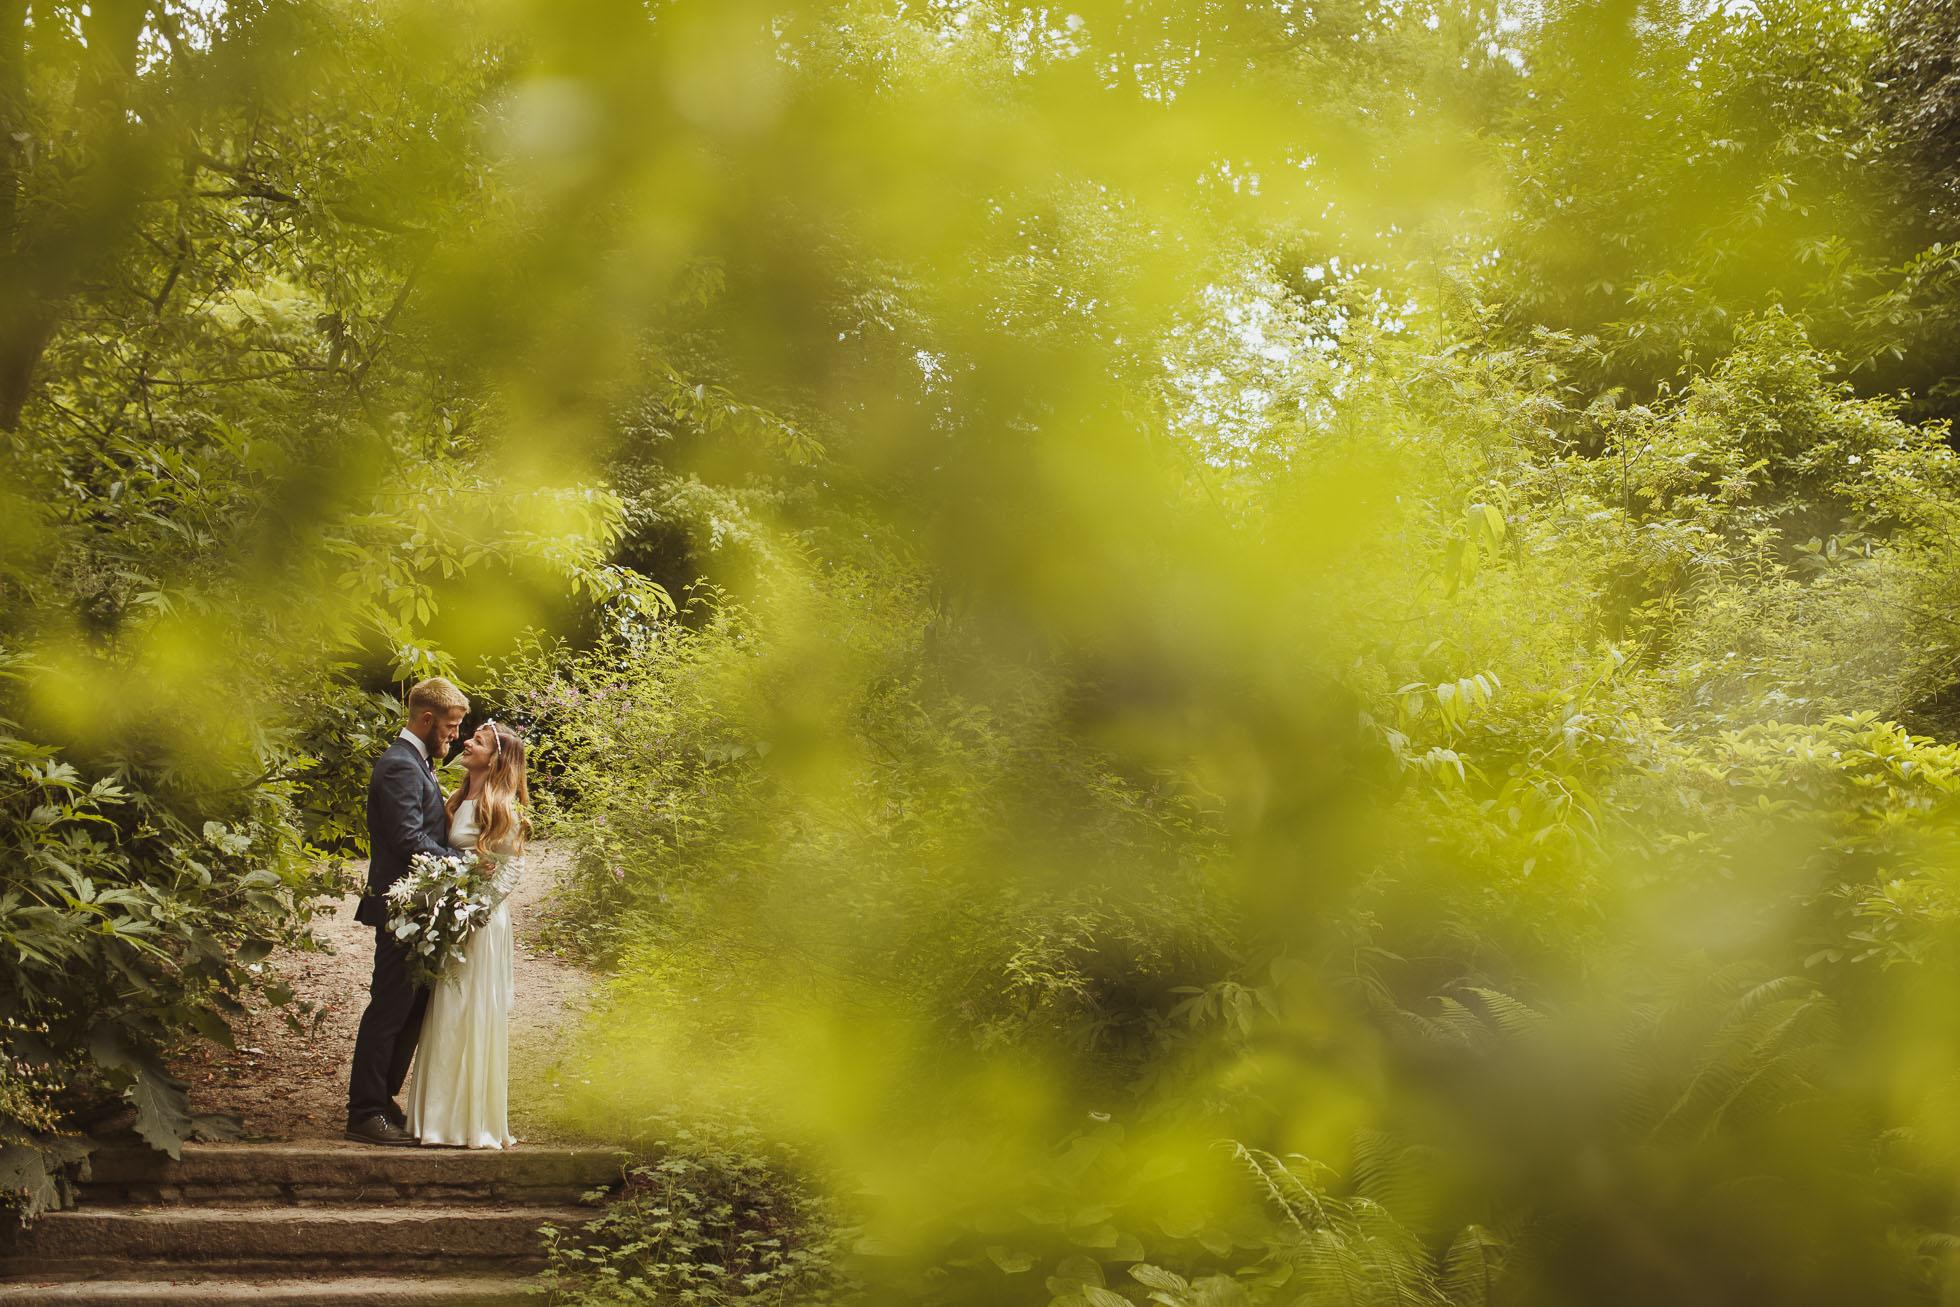 sheffield-botanical-gardens-wedding-photographer-38.jpg